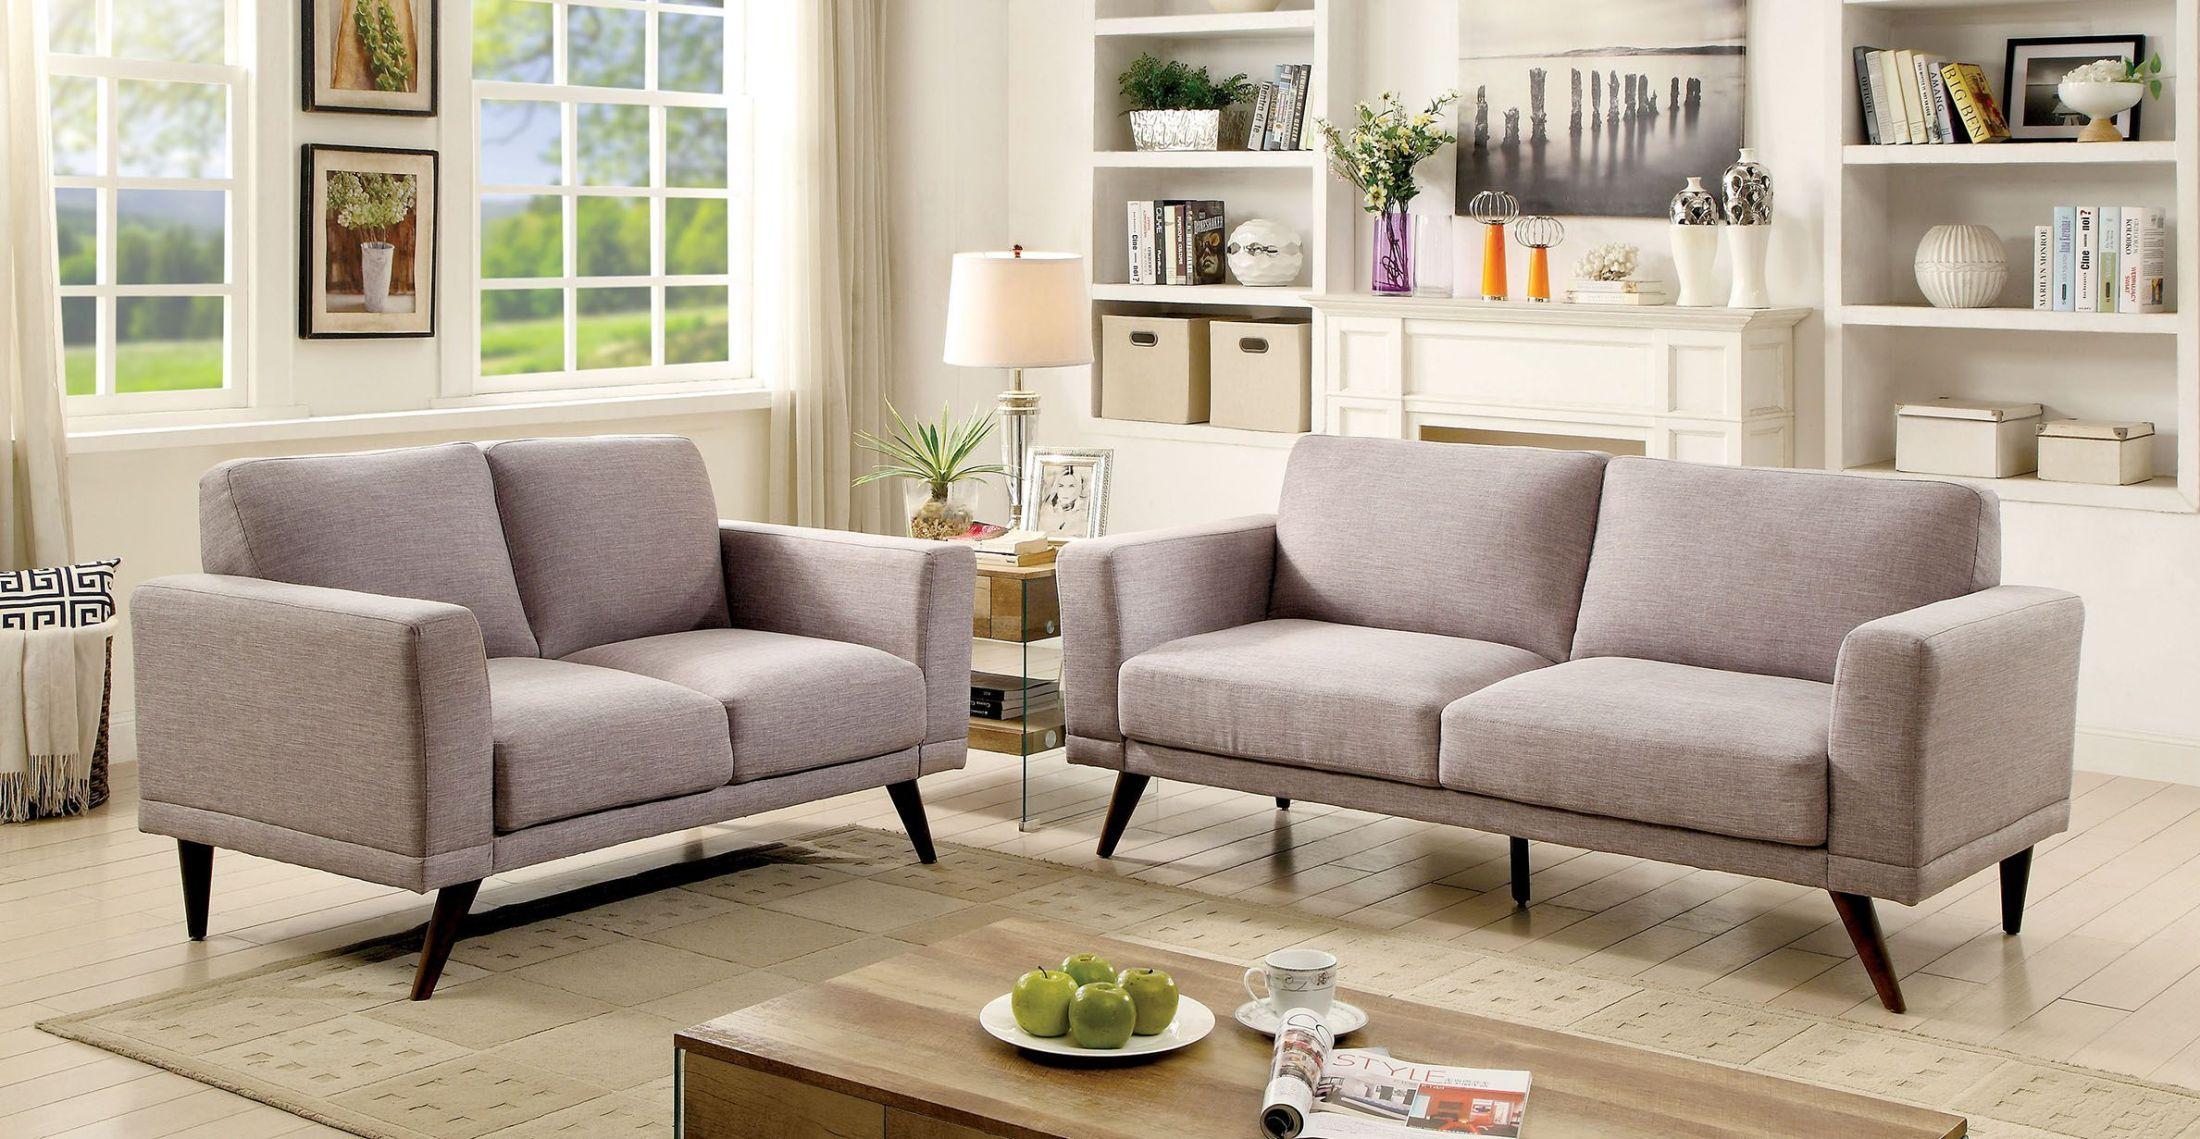 Furniture Of America Janie Gray Living Room Set